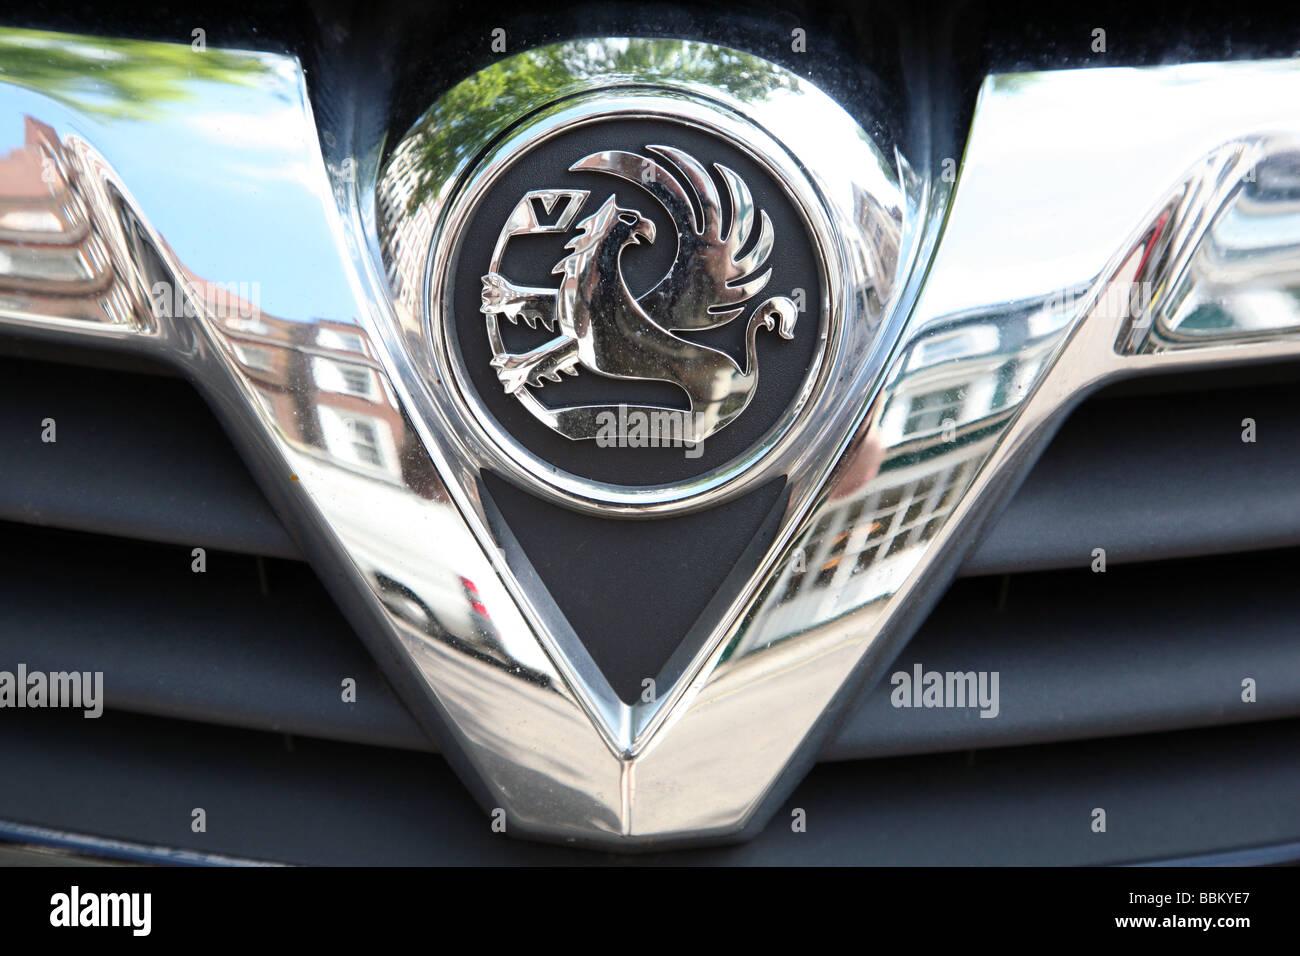 Badge on Vauxhall car, London - Stock Image